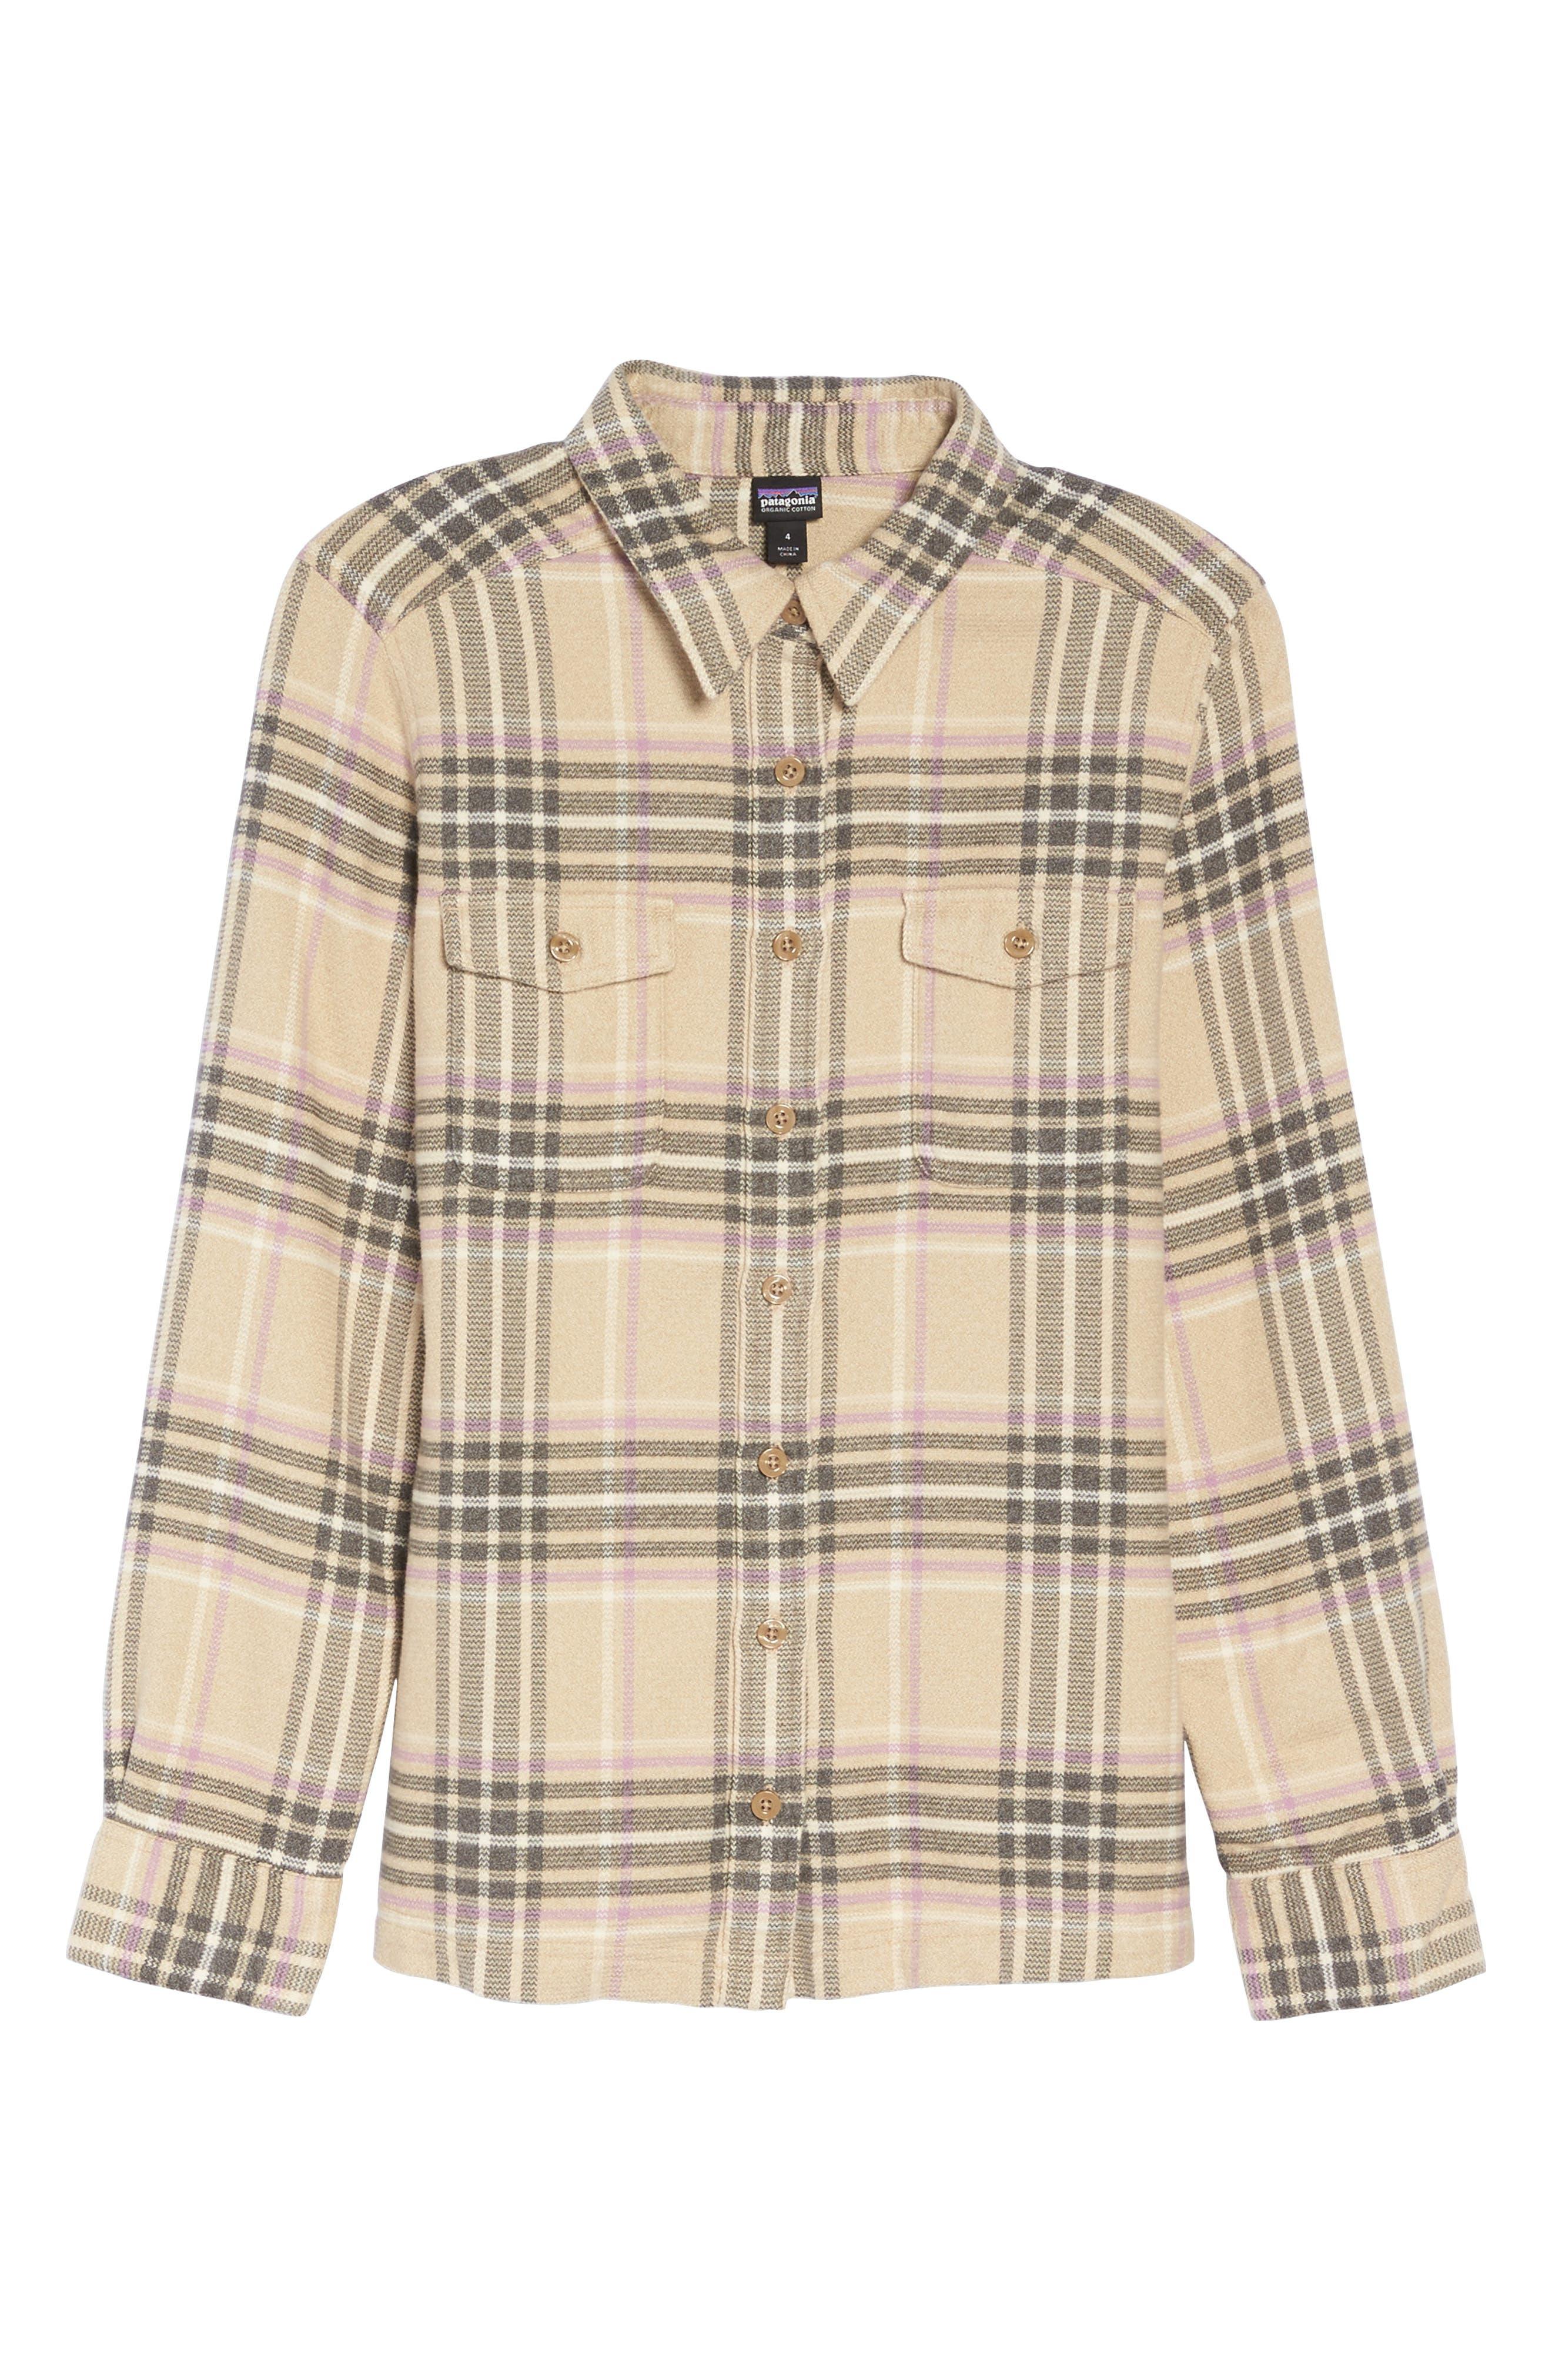 Main Image - Patagonia 'Fjord' Flannel Shirt